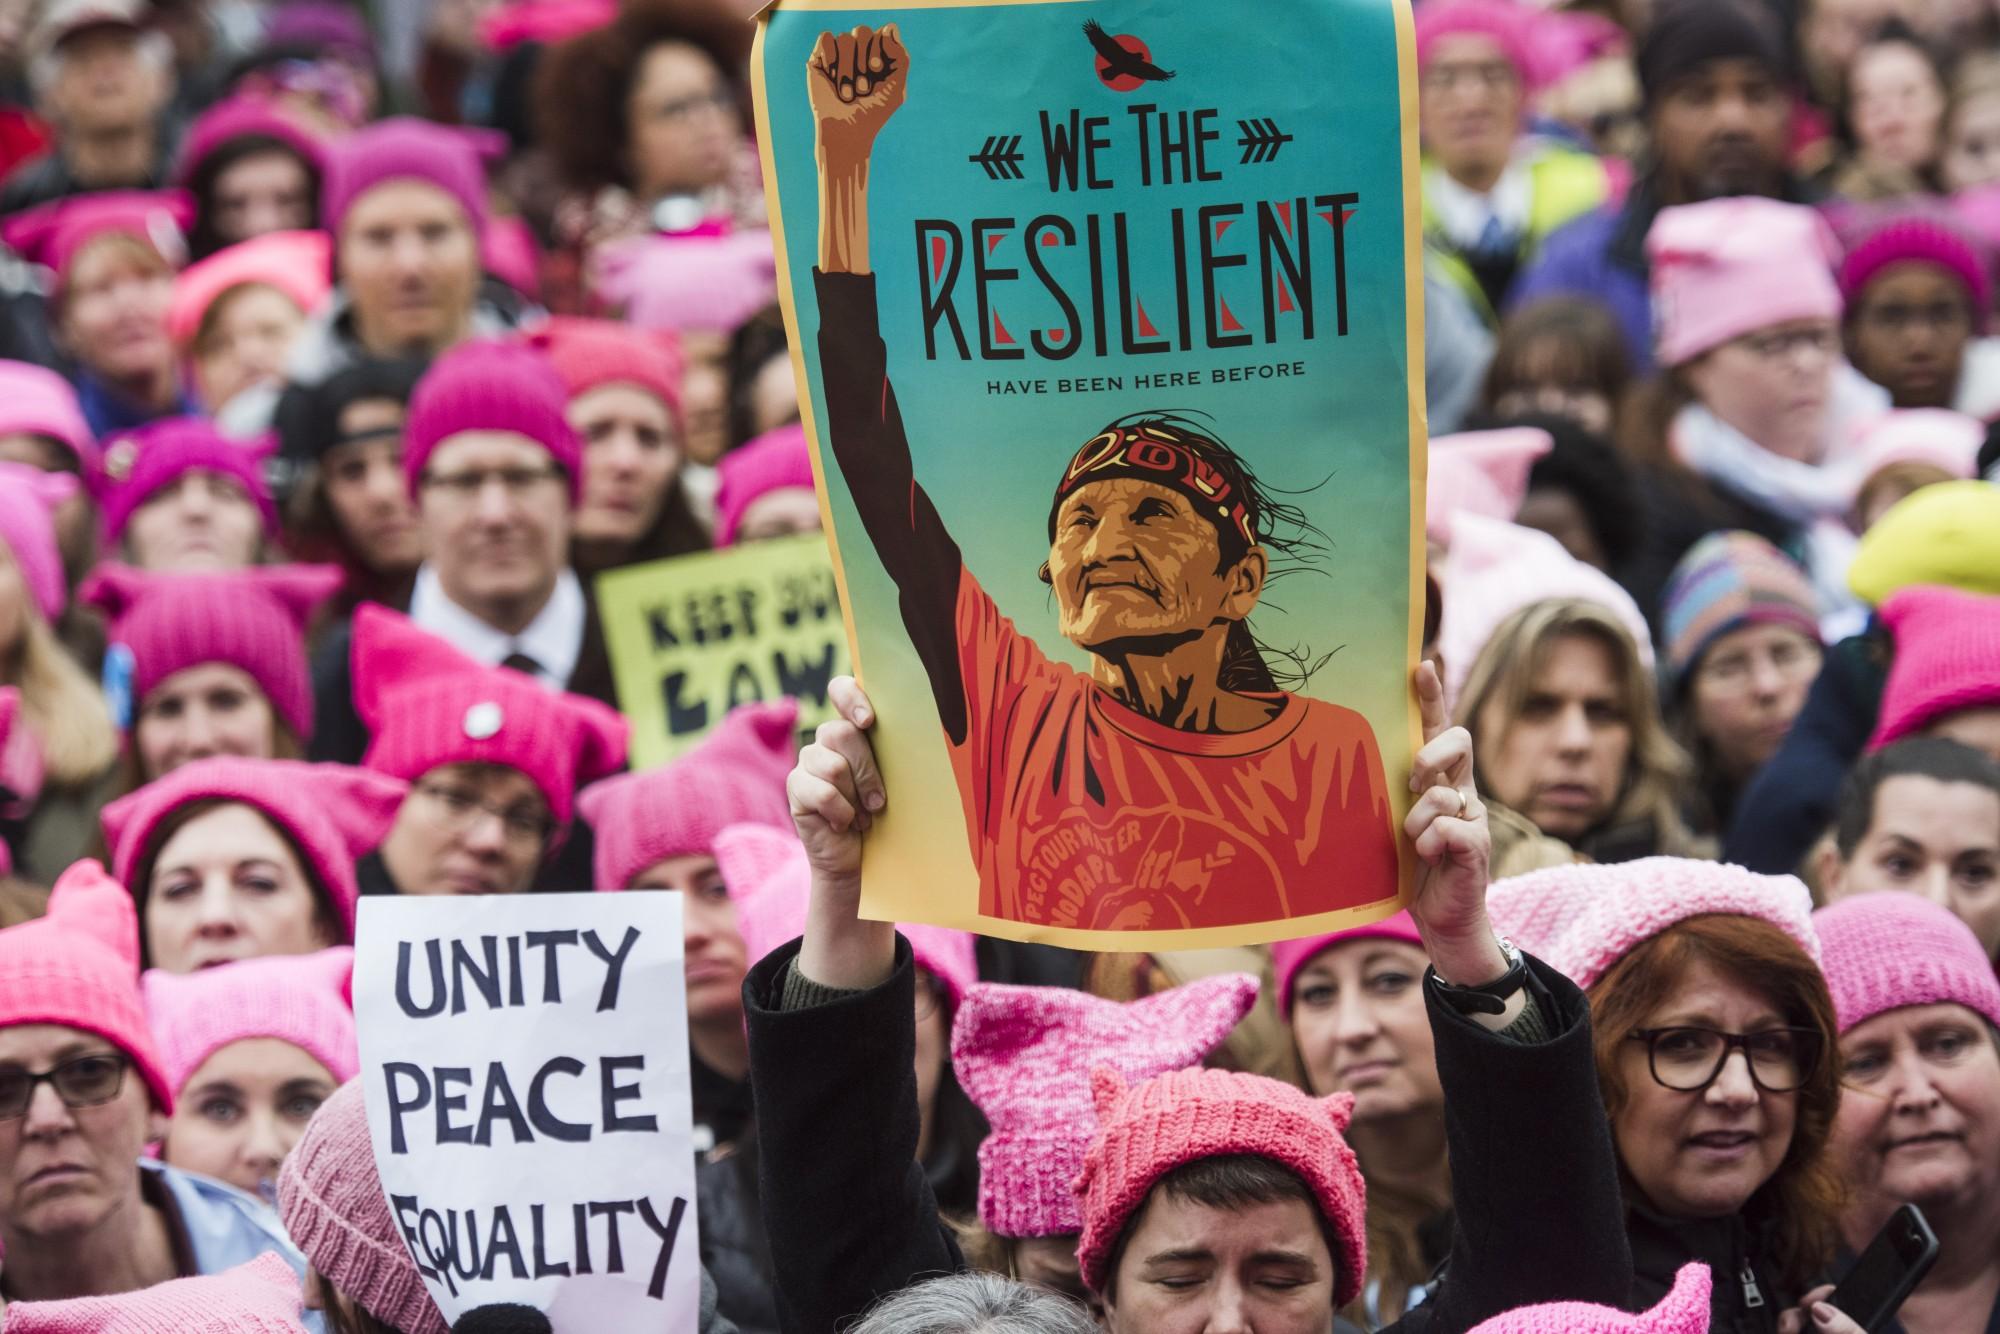 Amanda Voisard / The Washington Post